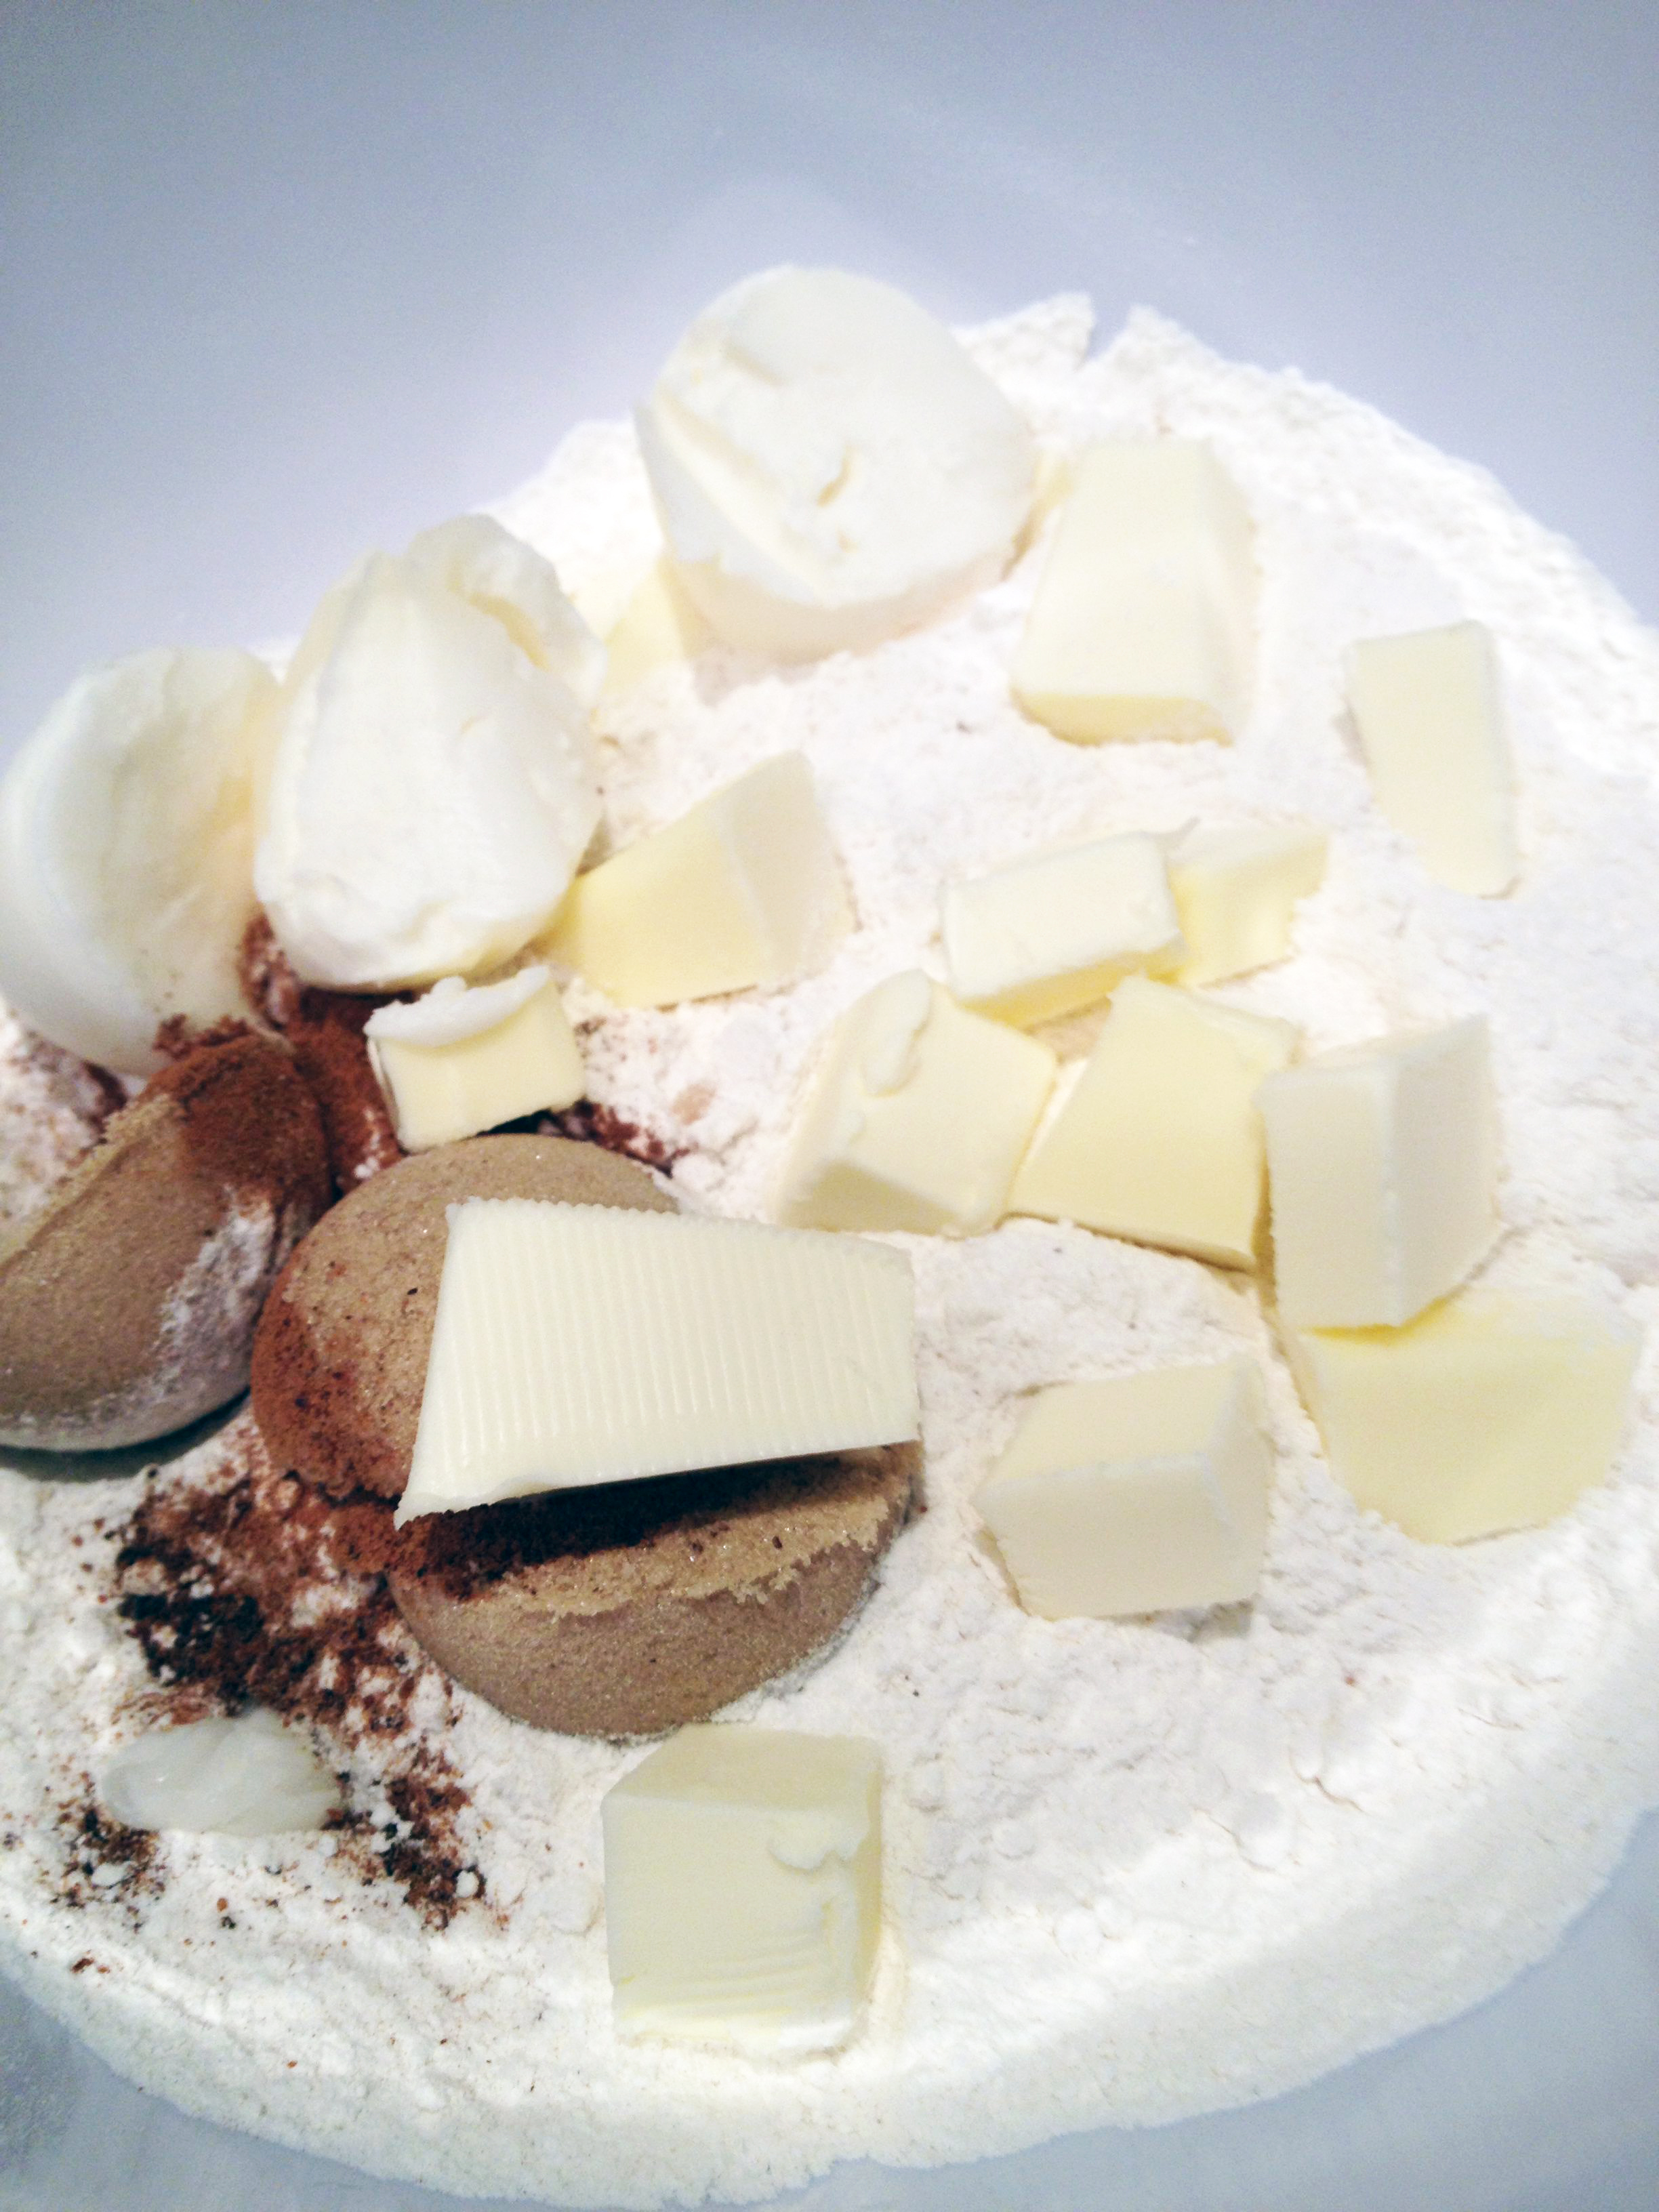 biscuit dry ingredients